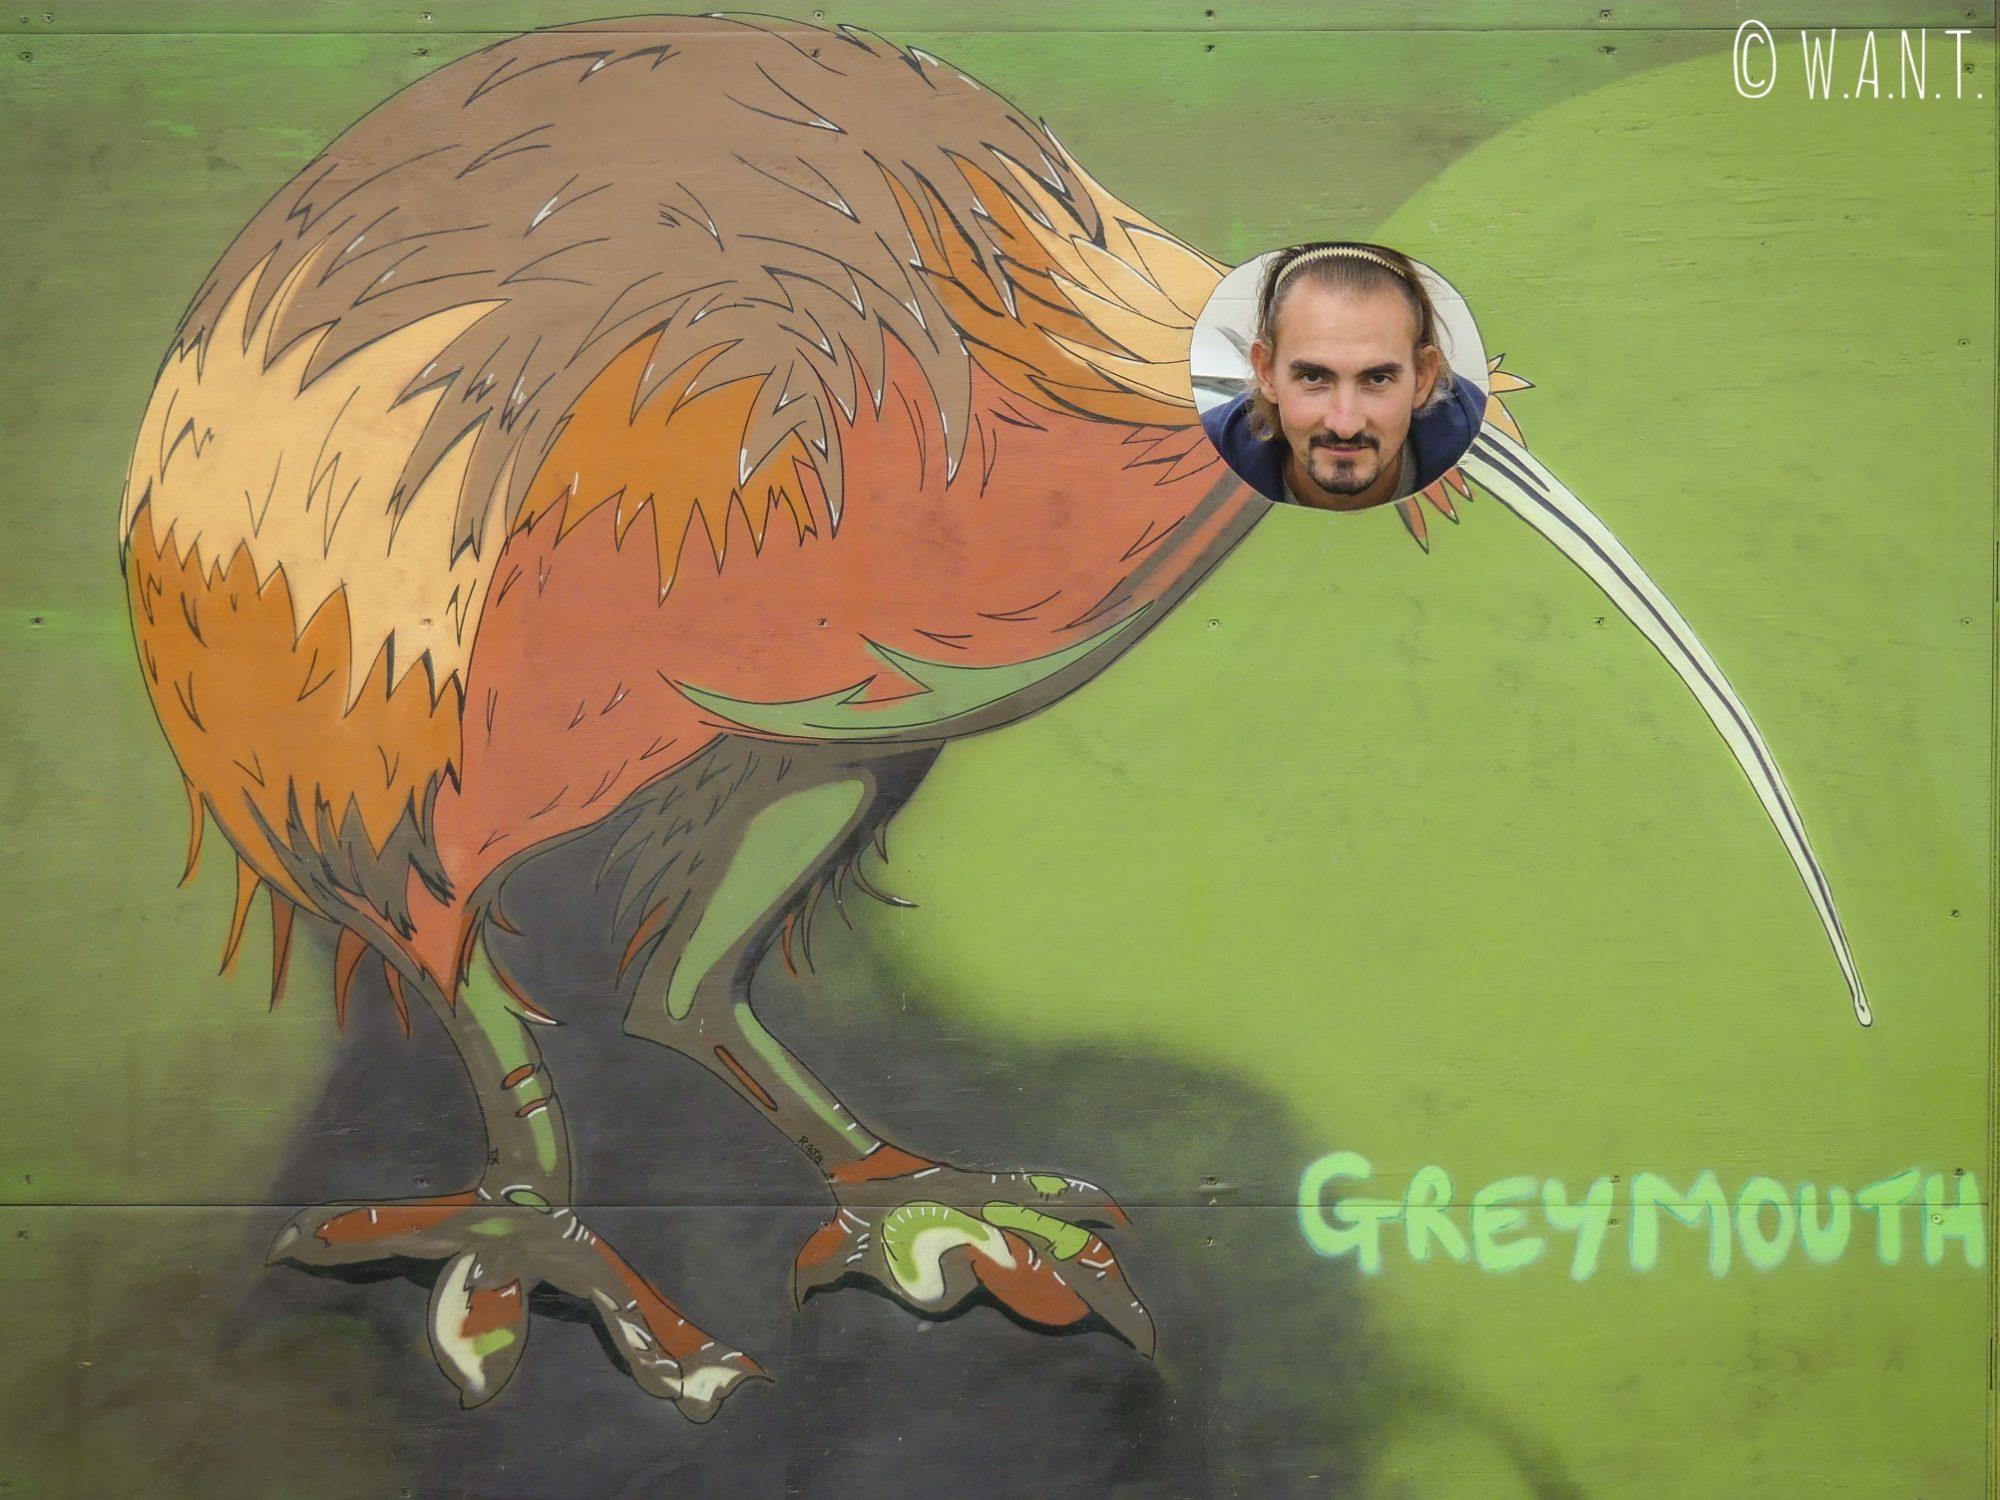 Benjamin se transforme en kiwi dans la ville de Greymouth en Nouvelle-Zélande